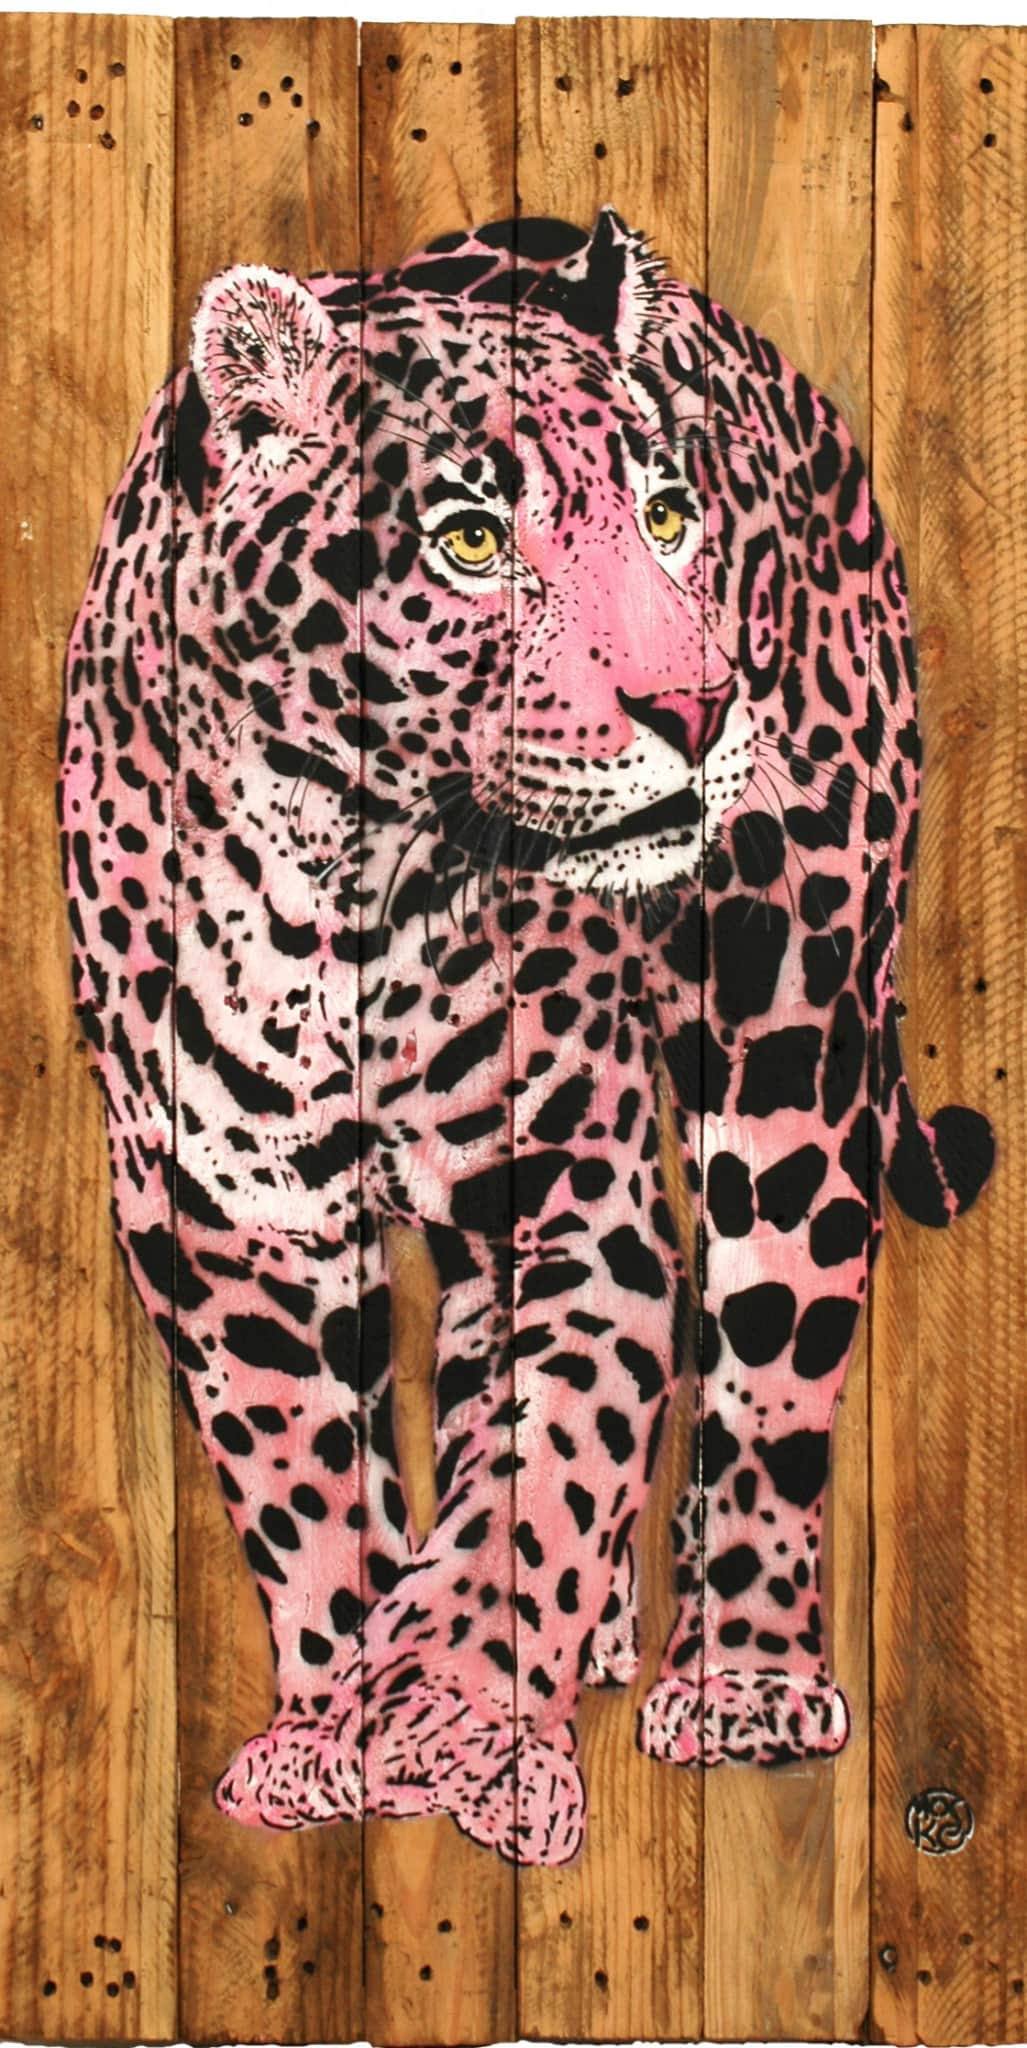 Galerie Art Jingle MOSKO Bébé Jaguar Rose 110 x 55 cm 2021